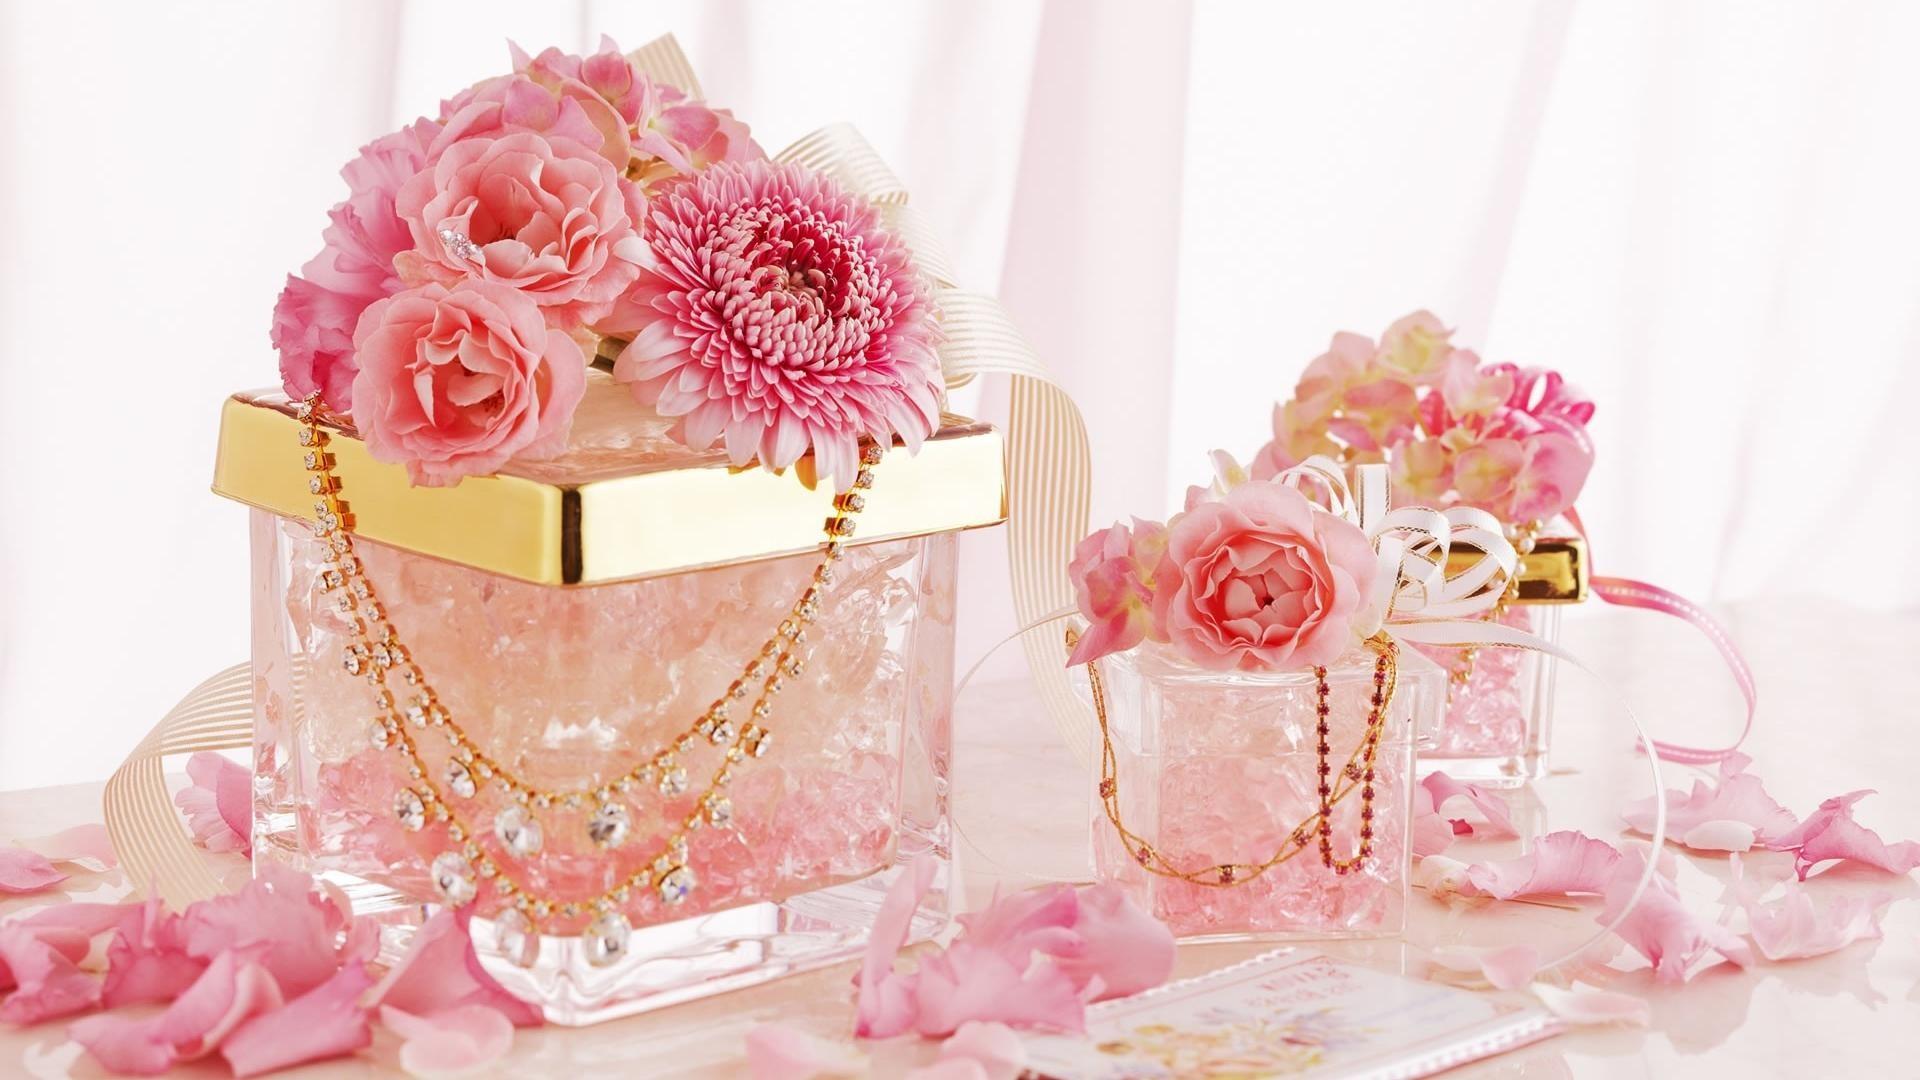 Fotografie – Stillleben Glas Pink Flower Petal Gold Diamond Schmuck  Chrysanthemen Rose Blume Wallpaper